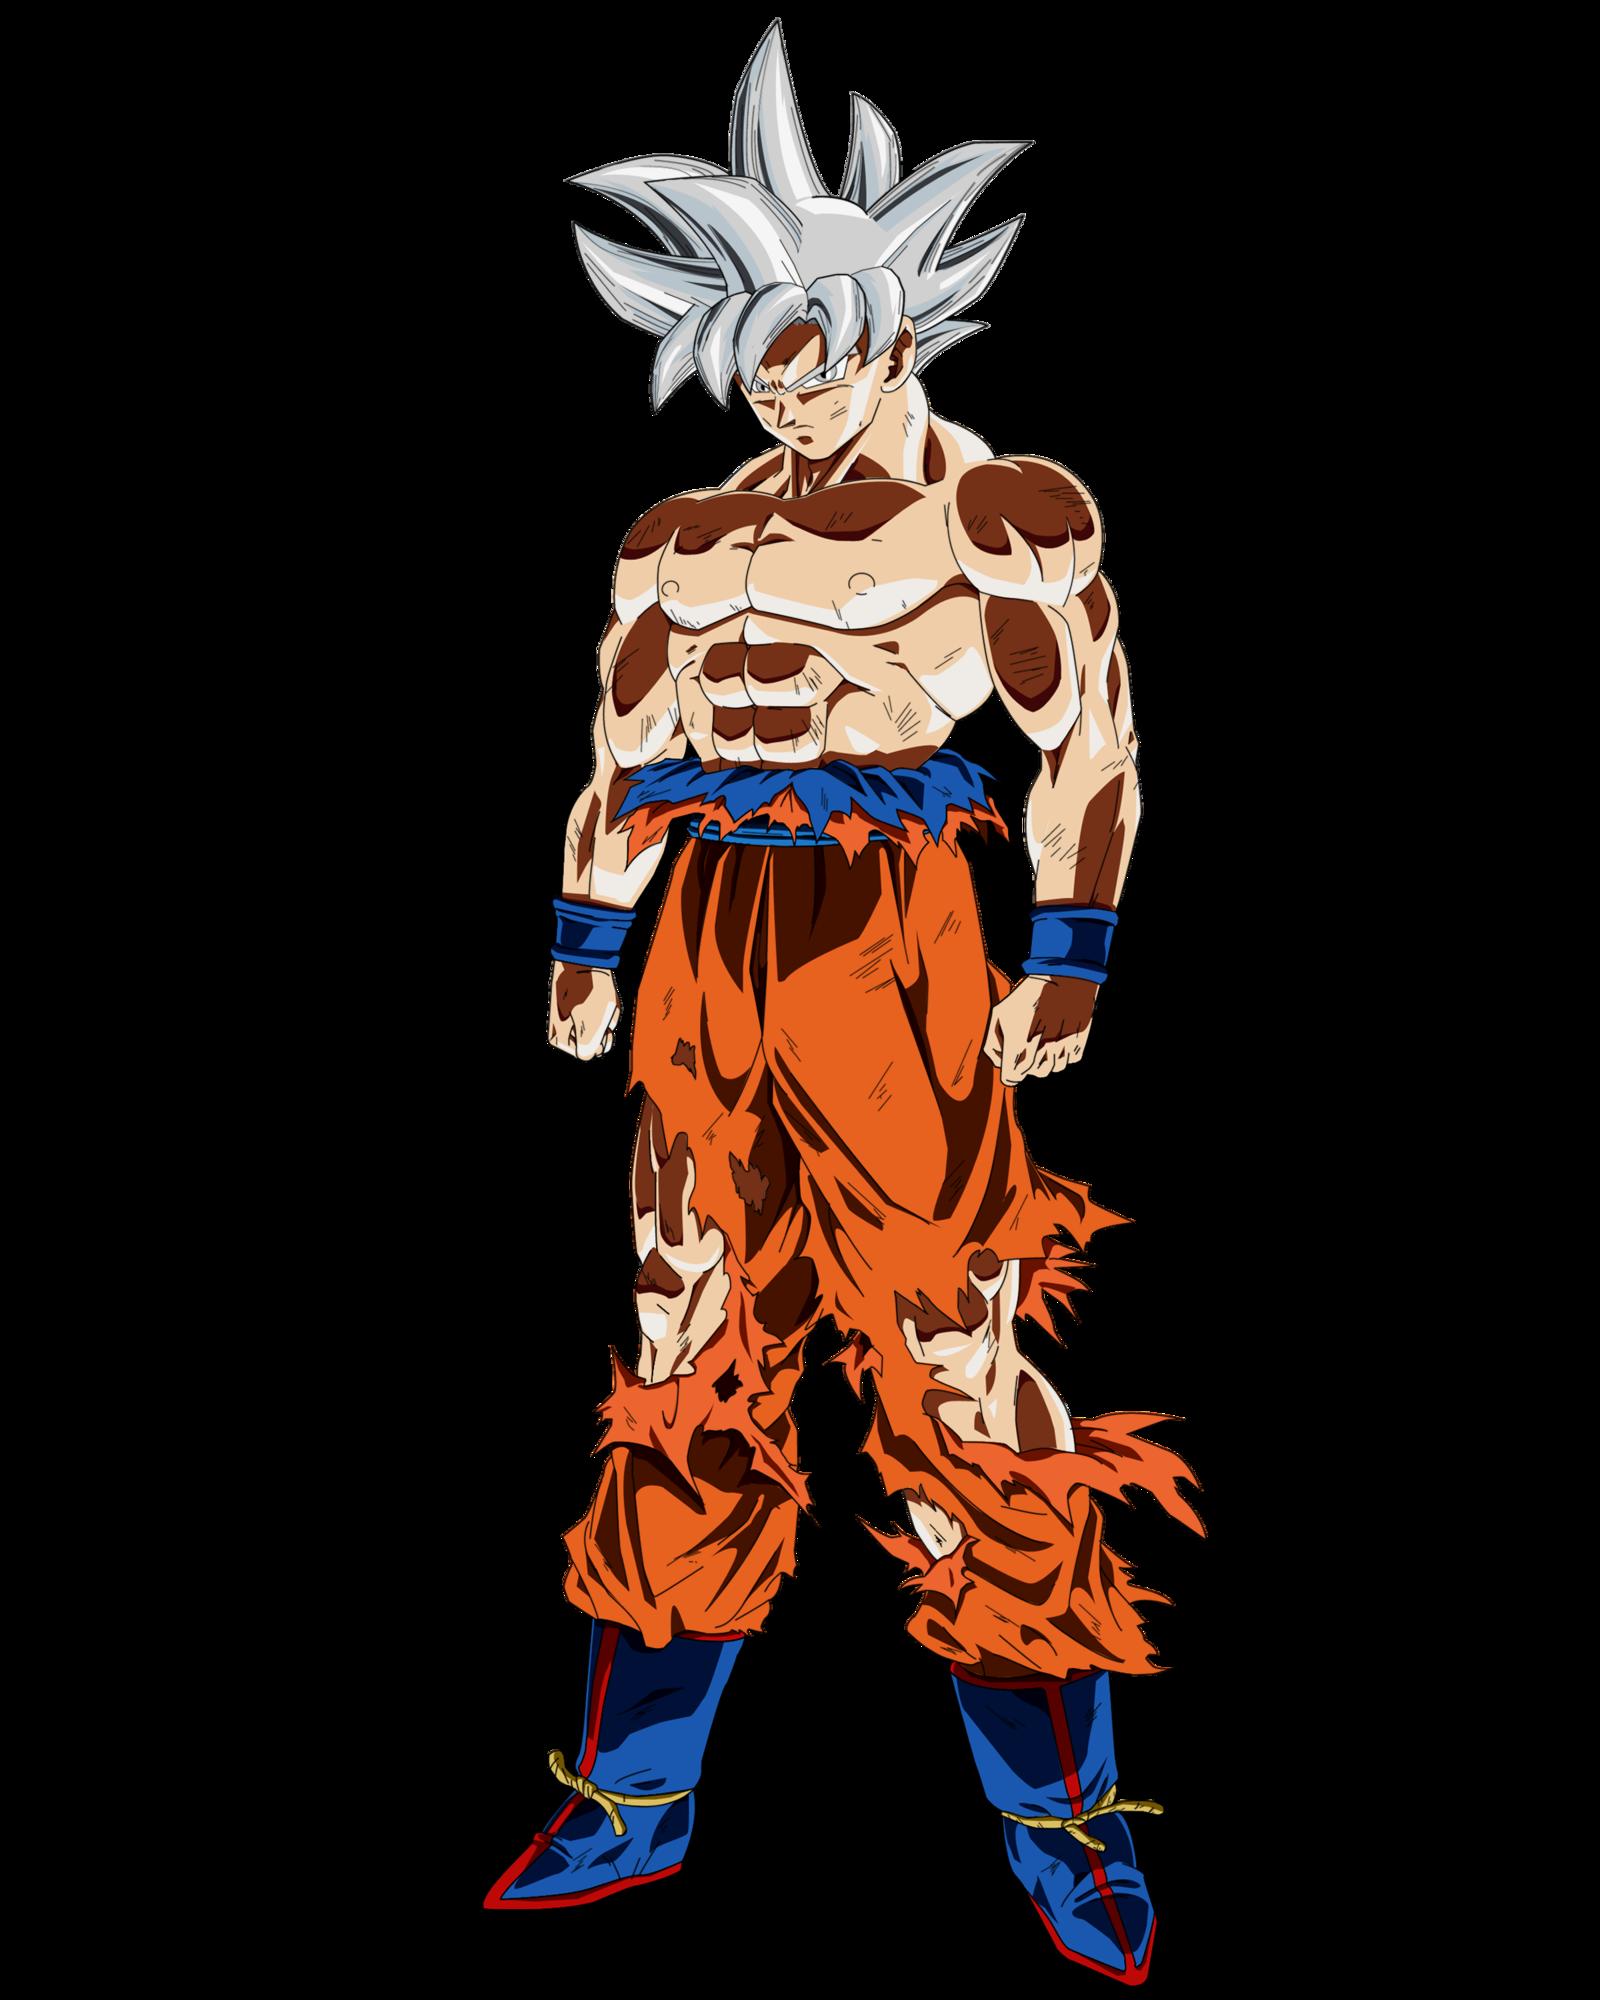 Mastered Ultra Instinct Goku By Ruga Rell Dragon Ball Super Manga Dragon Ball Super Goku Dragon Ball